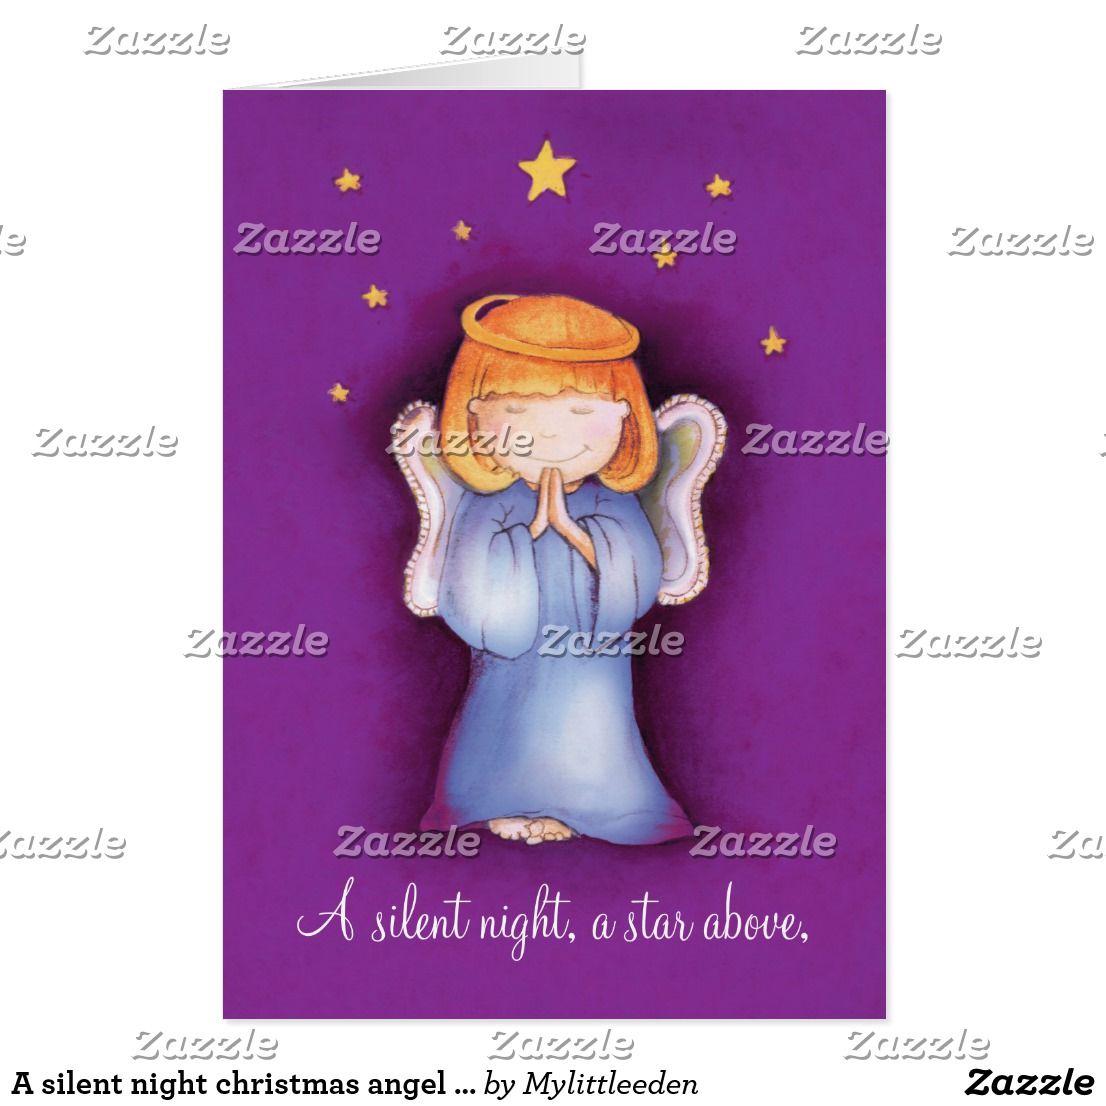 A silent night christmas angel greeting card mauve | Silent night